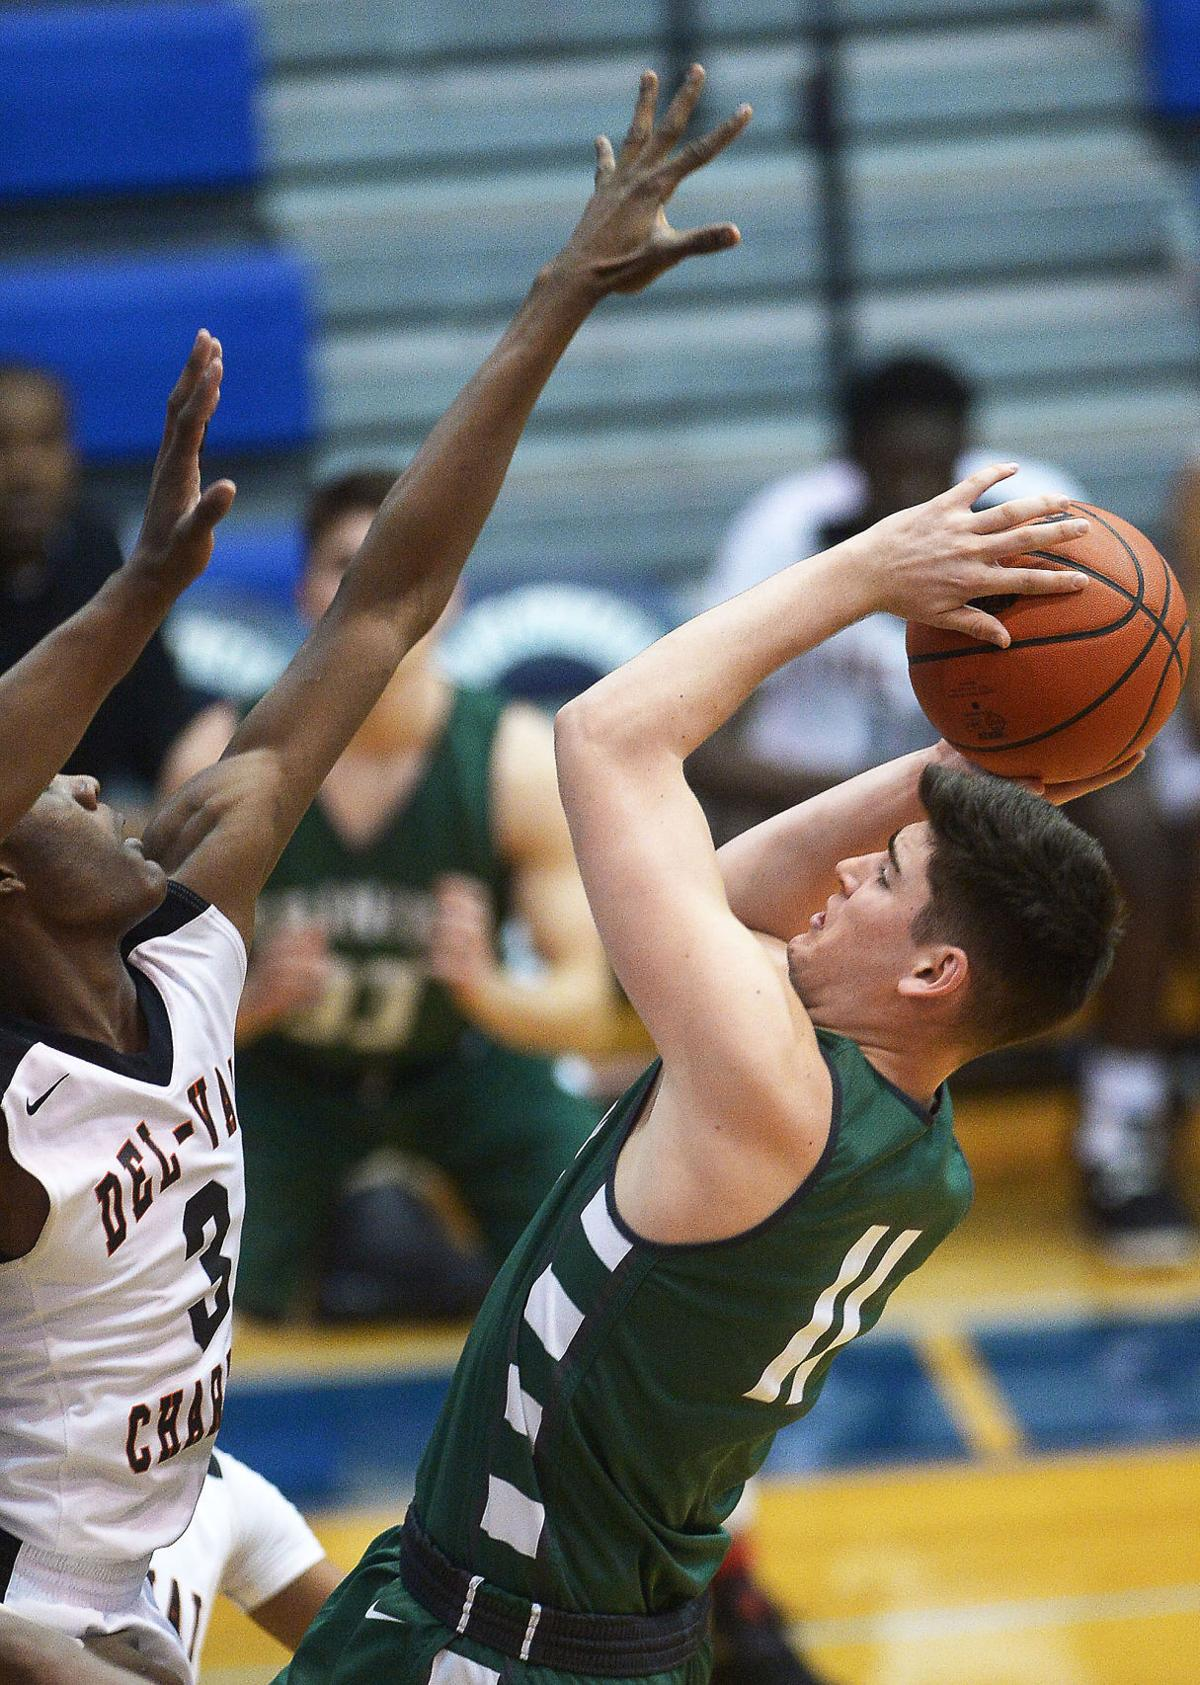 PIAA Class 3A Boys Basketball: Trinity vs Delaware-Valley Charter